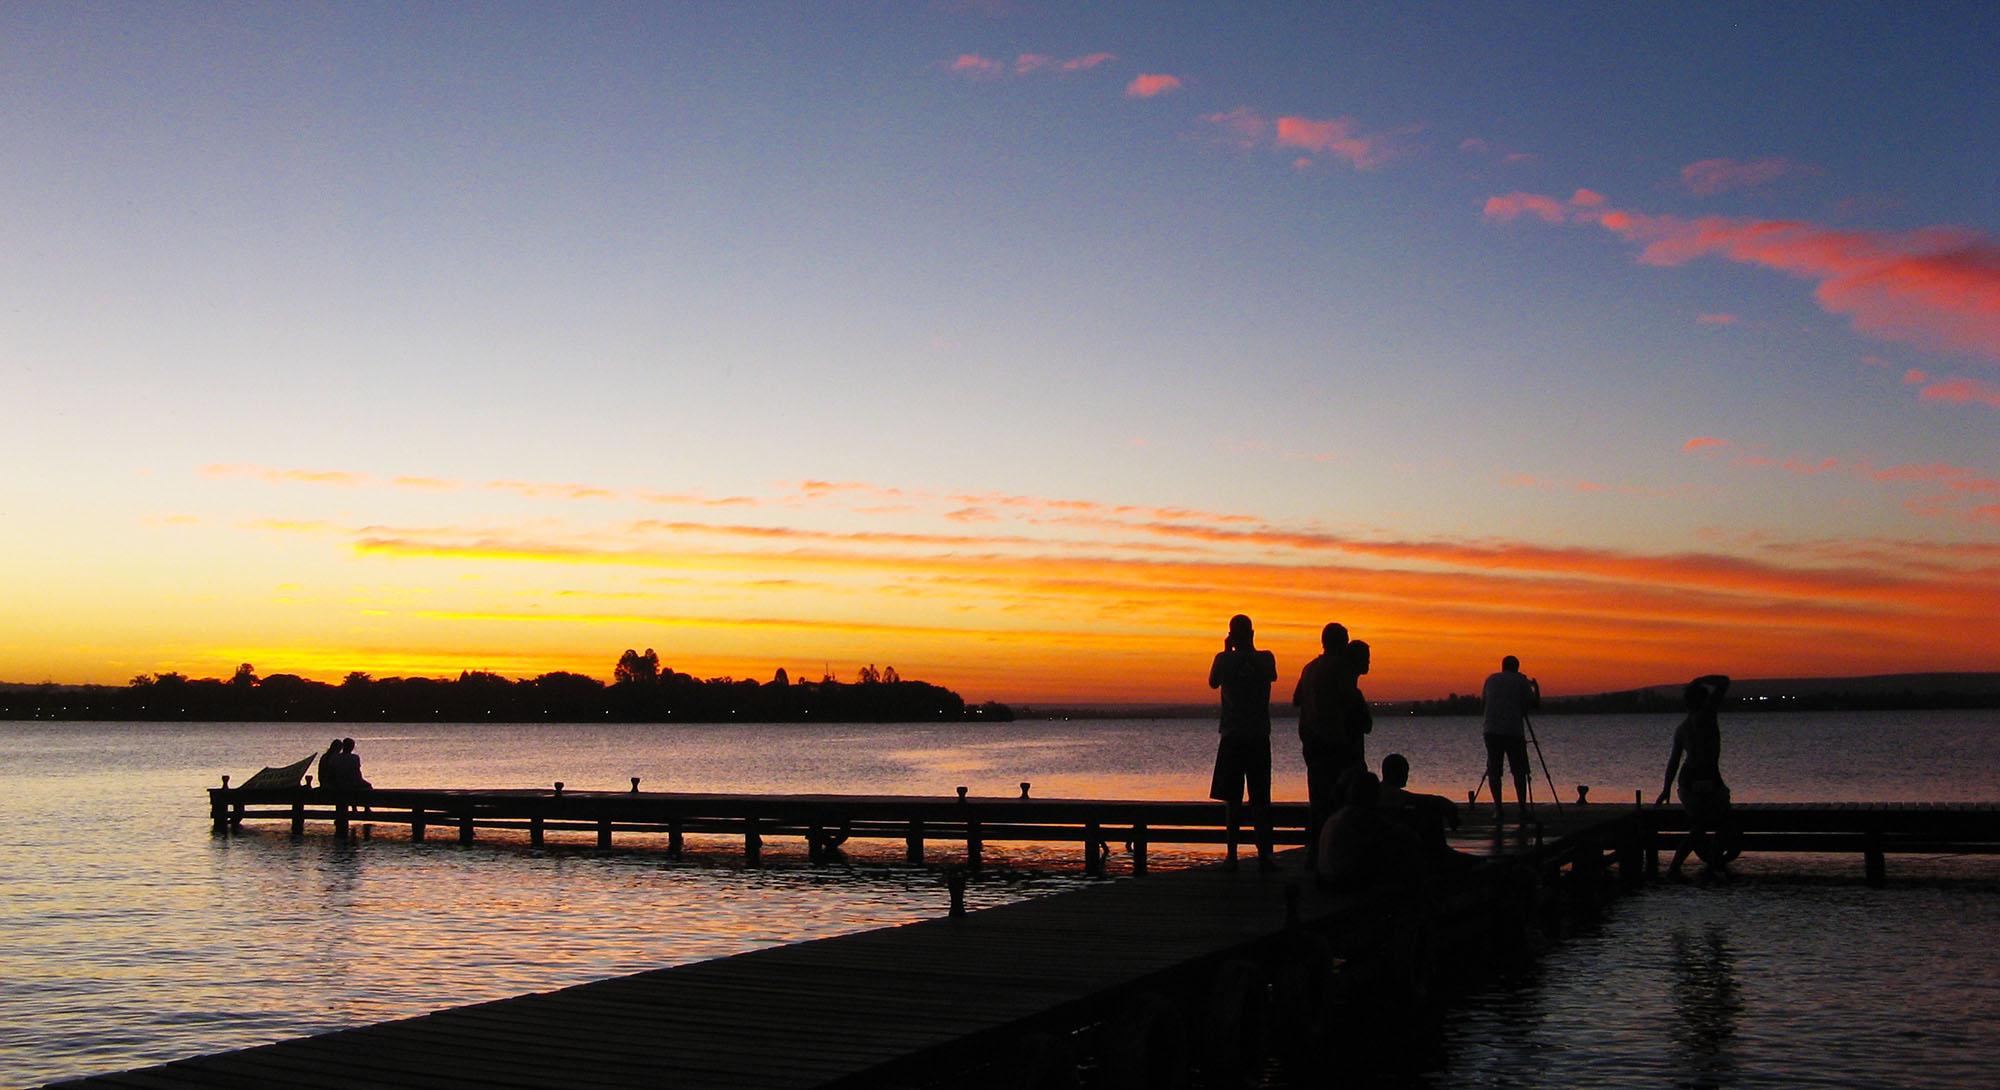 tramonto_lago paranoà